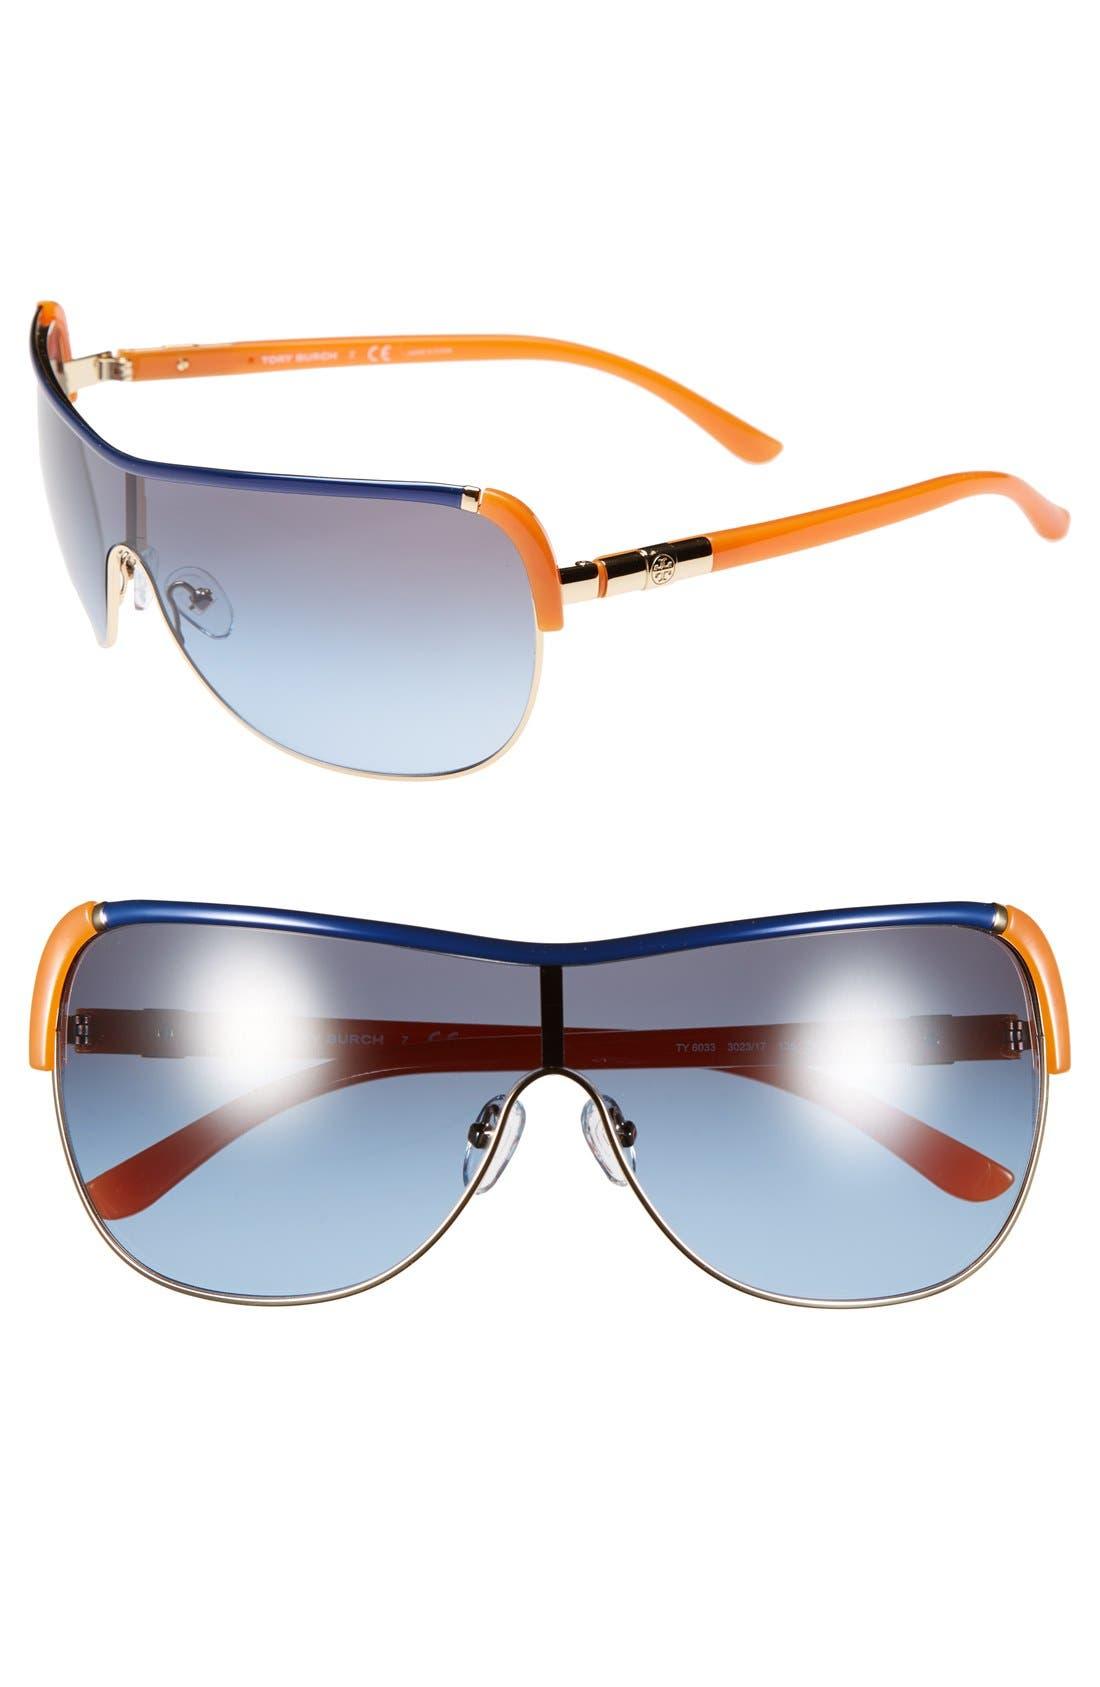 Main Image - Tory Burch 'Pilot' 34mm Metal Wrap Sunglasses